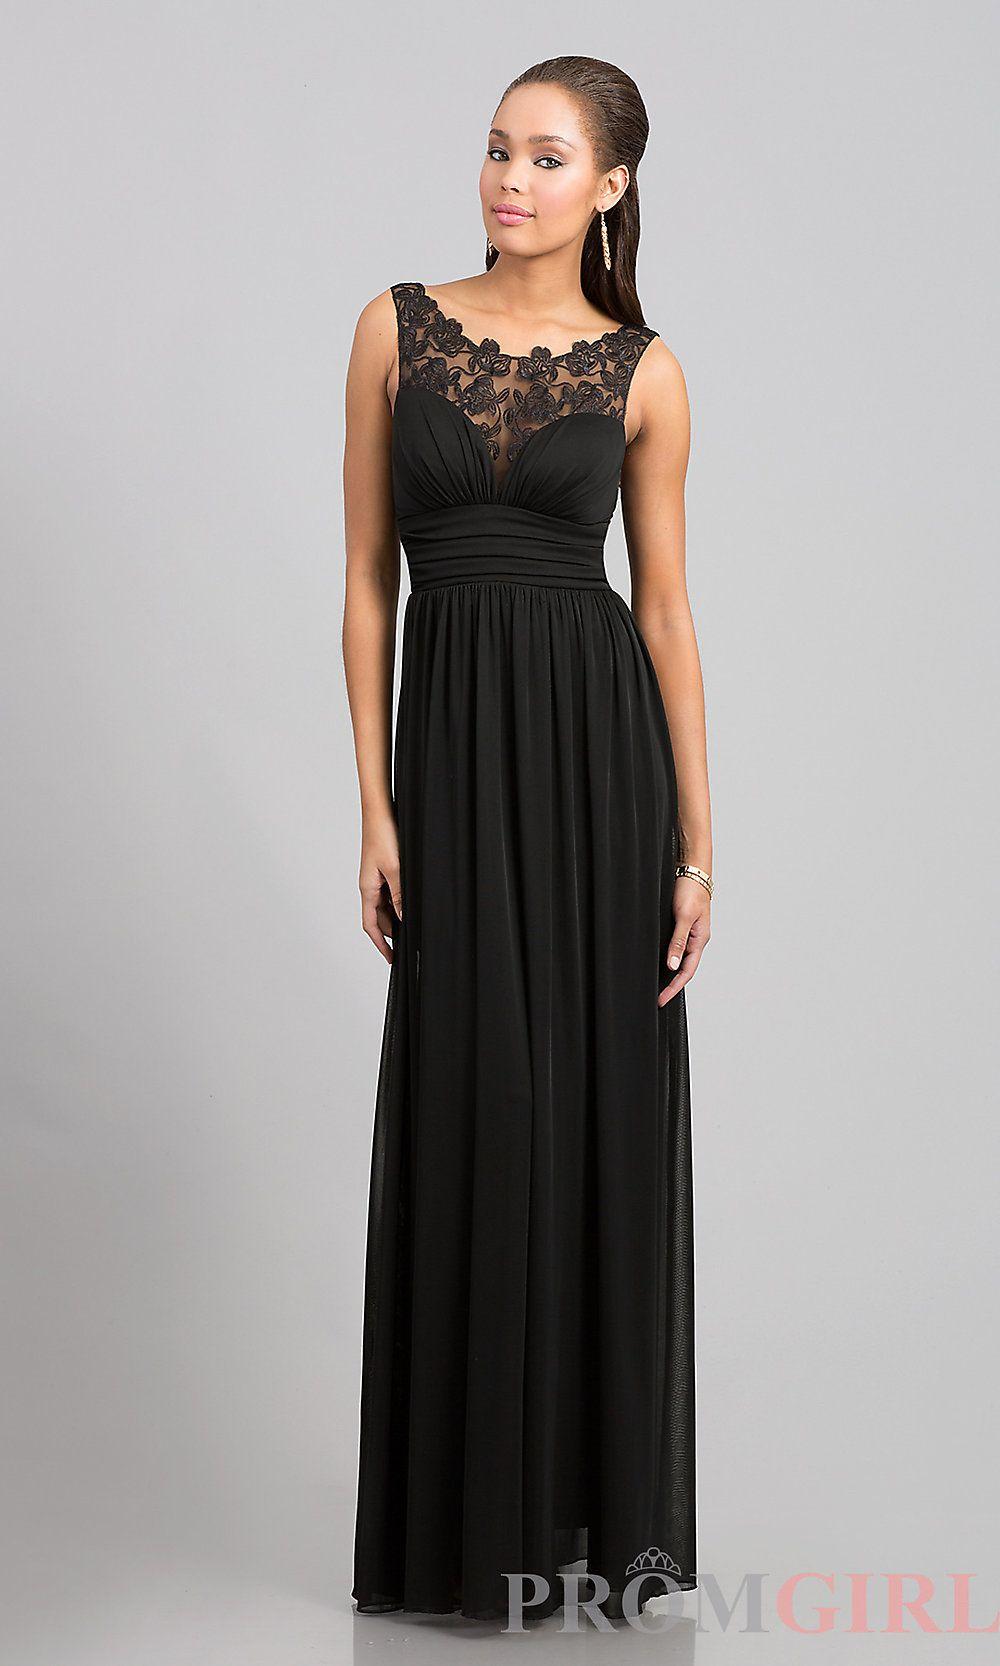 f69509e48c03 Floor-Length Illusion-Lace Sleeveless Dress | Bridesmaids Dresses ...